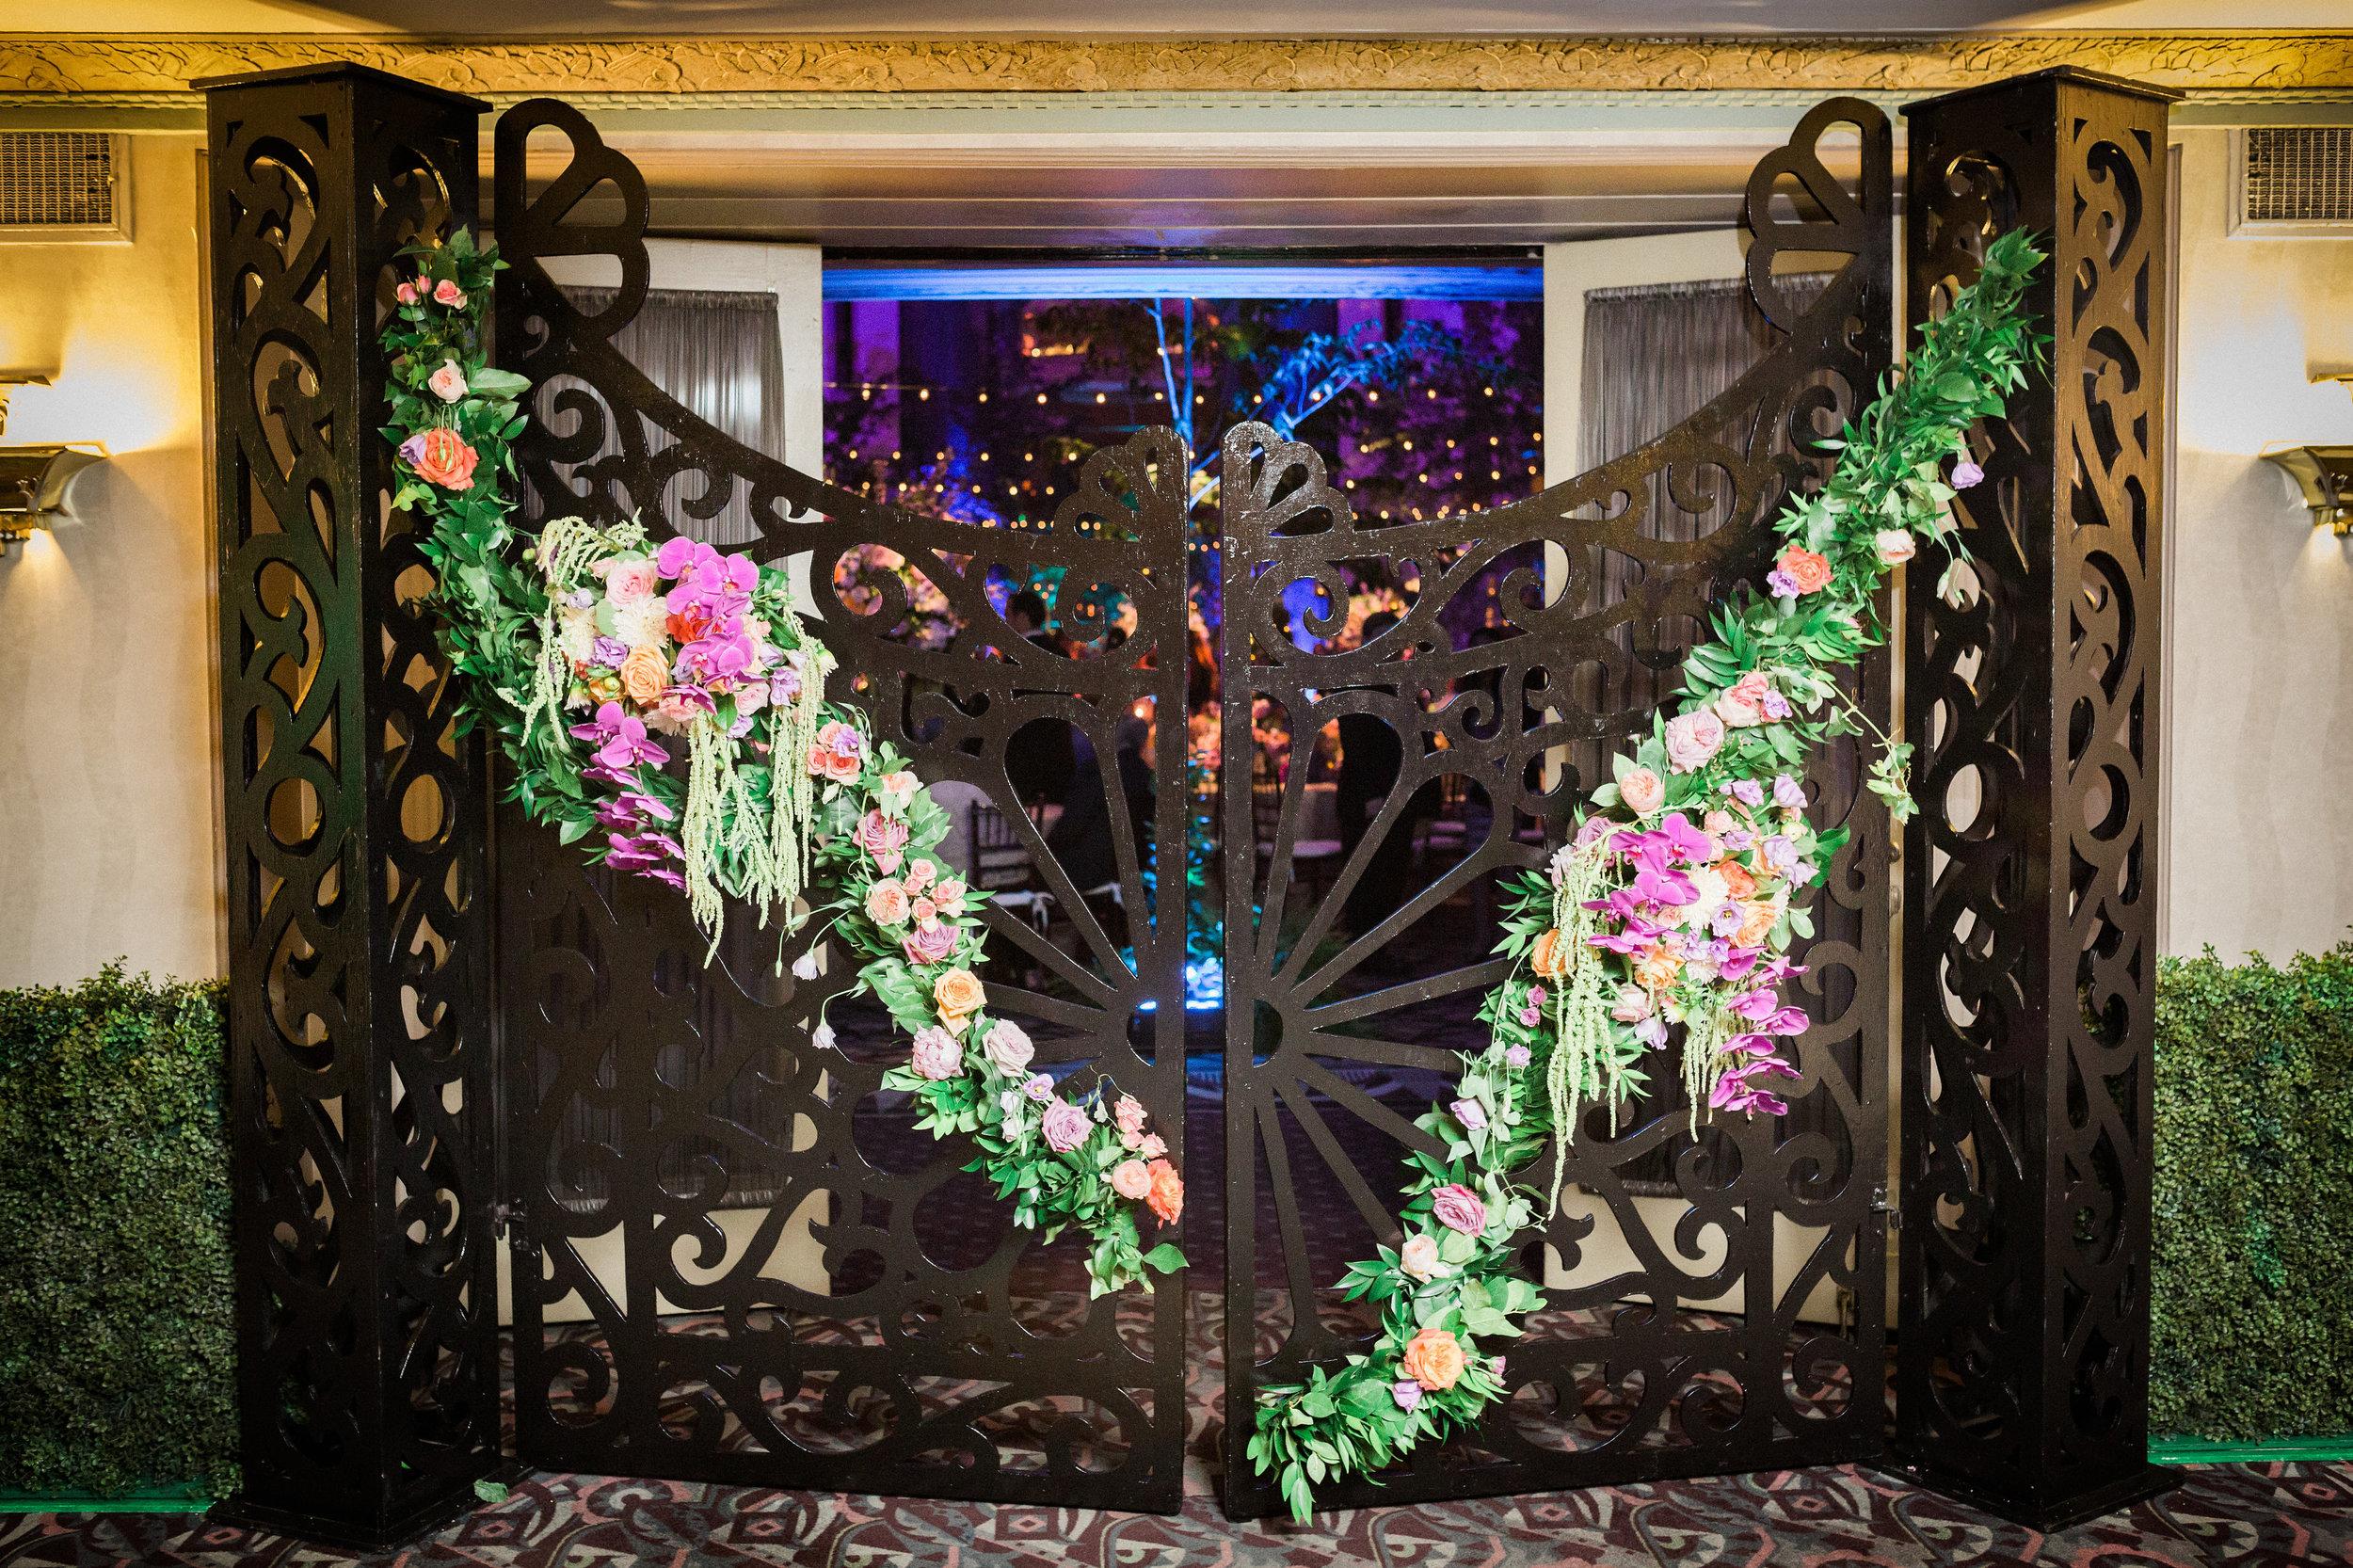 Grand Enterance to Reception at The Hilton Netherland Plaza Hall of Mirrors Cincinnati, OH